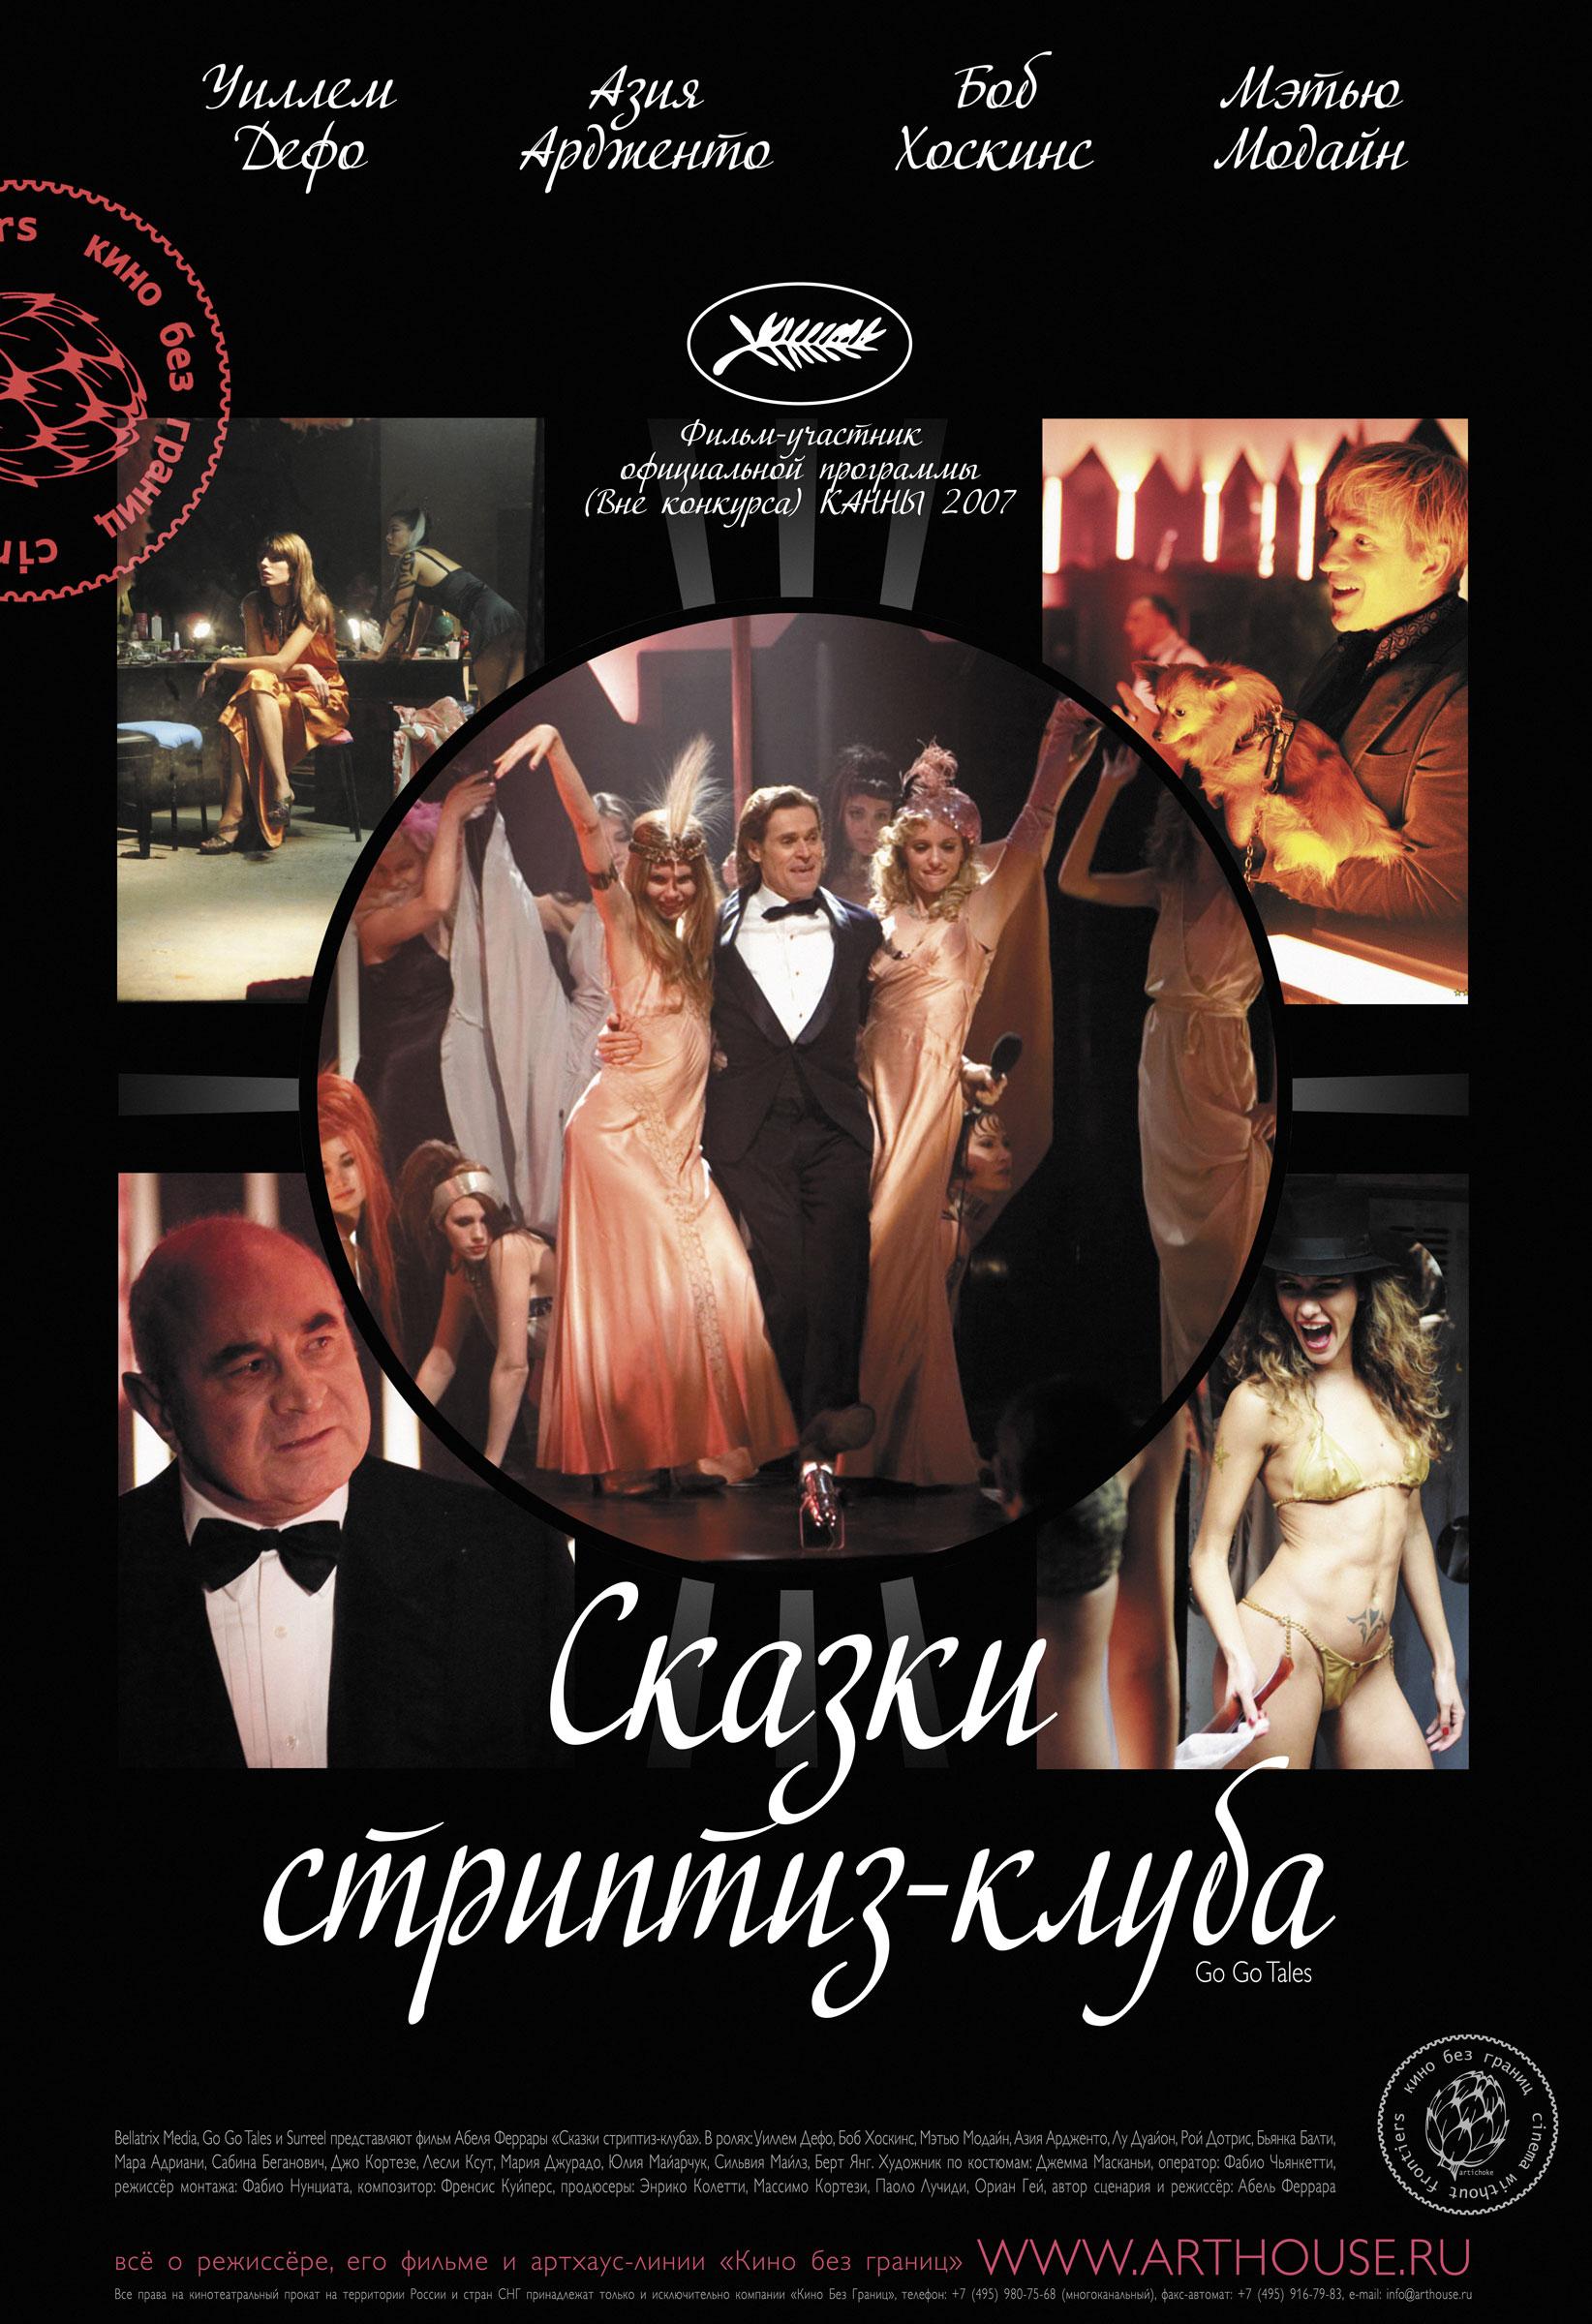 Сказки стриптиз-клуба / Go Go Tales 2007 / DVDRip Comedy / Drama